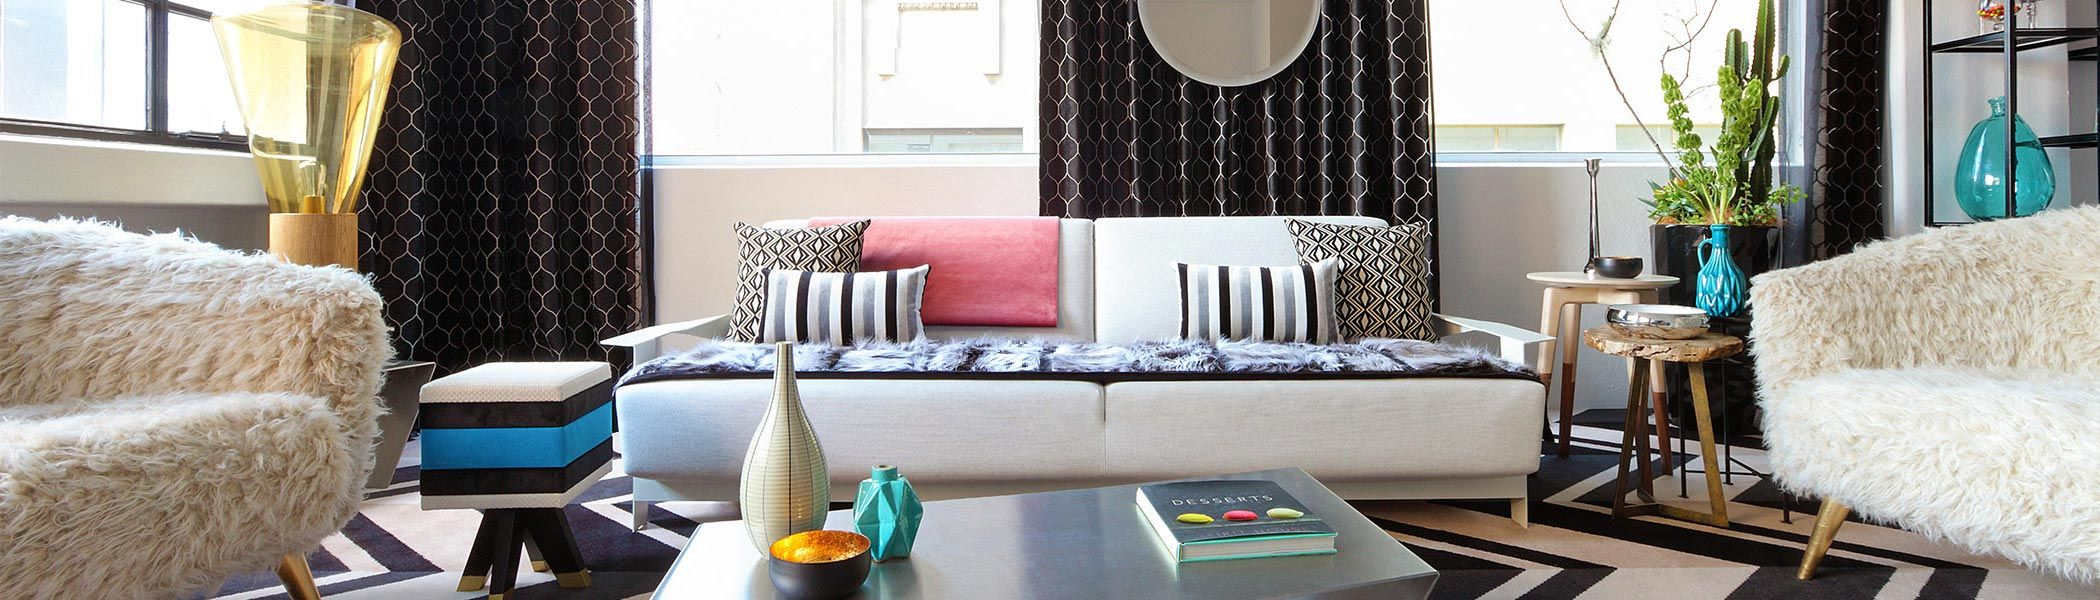 Adelphi Hotel - Melbourne, Australia. Interior design awards, Australian interior design